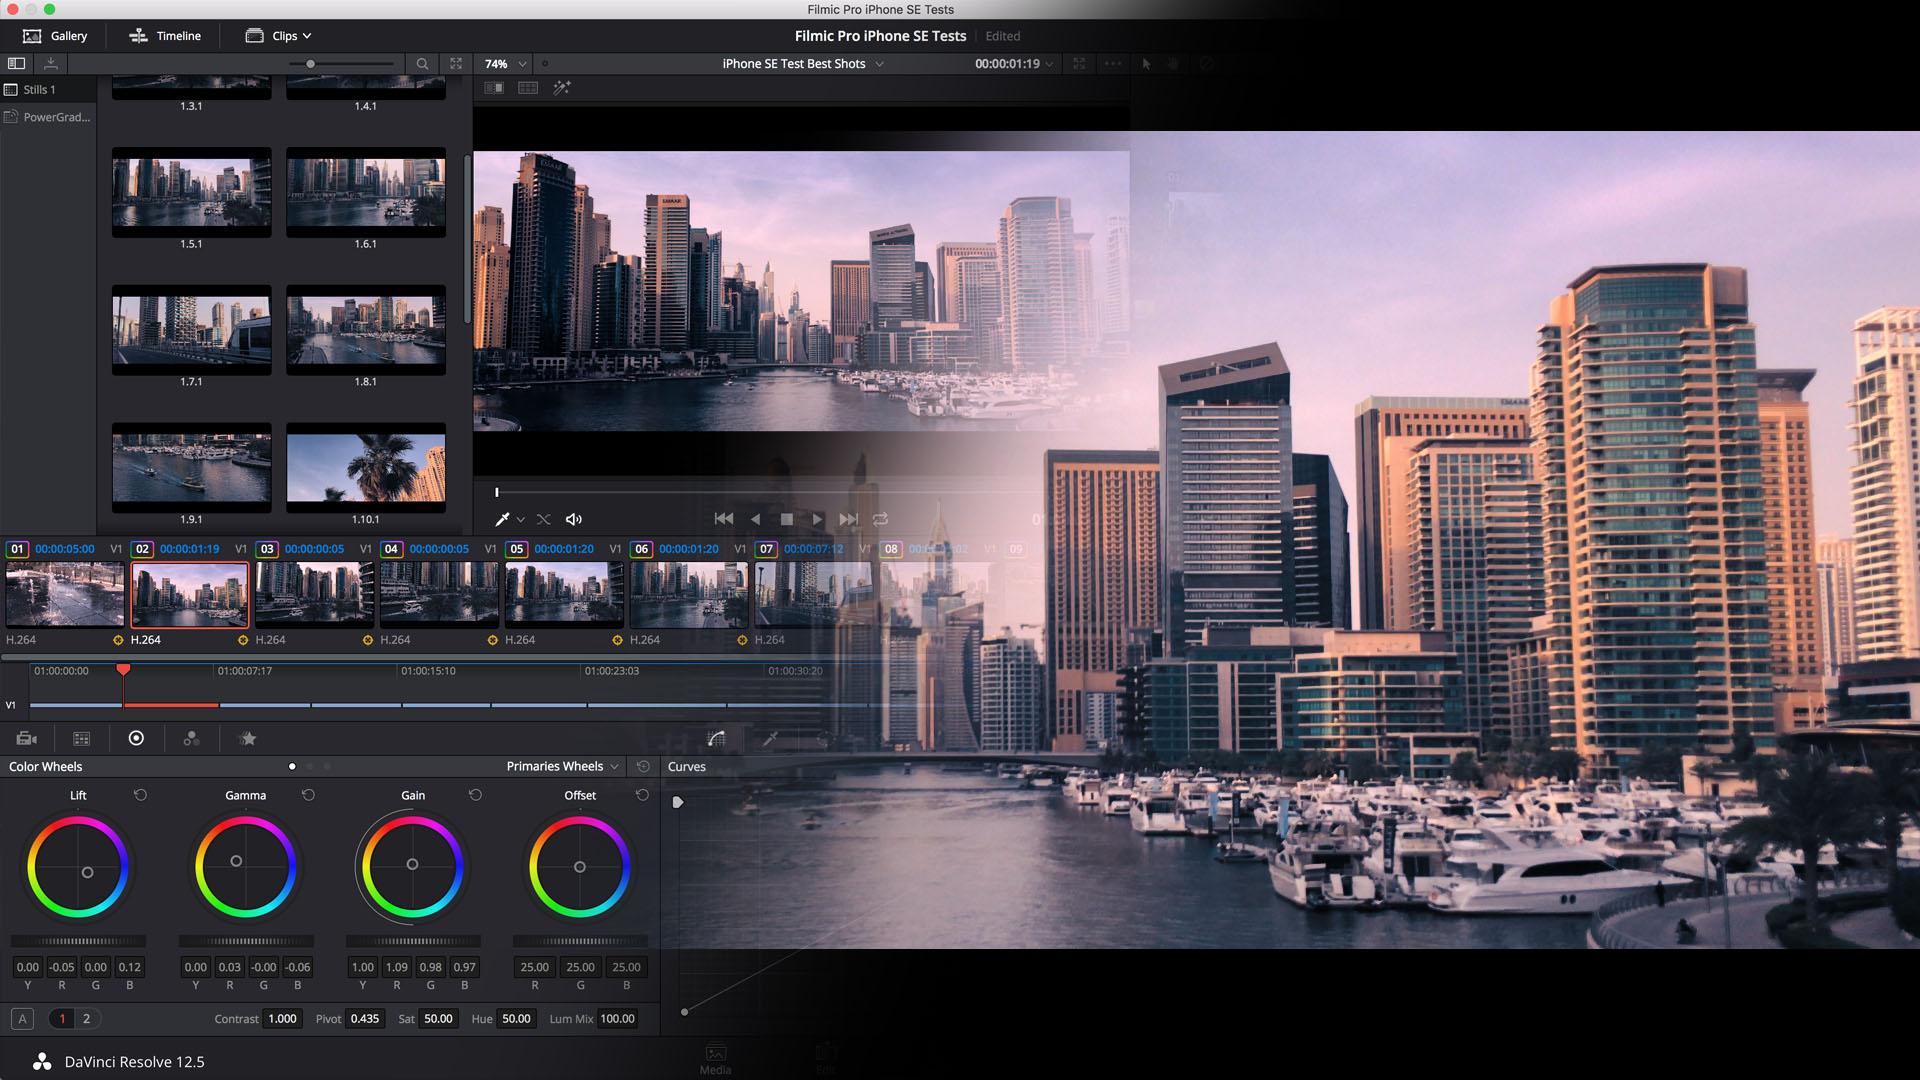 Filmic Pro – iPhoneでシネマライクな映像を撮る